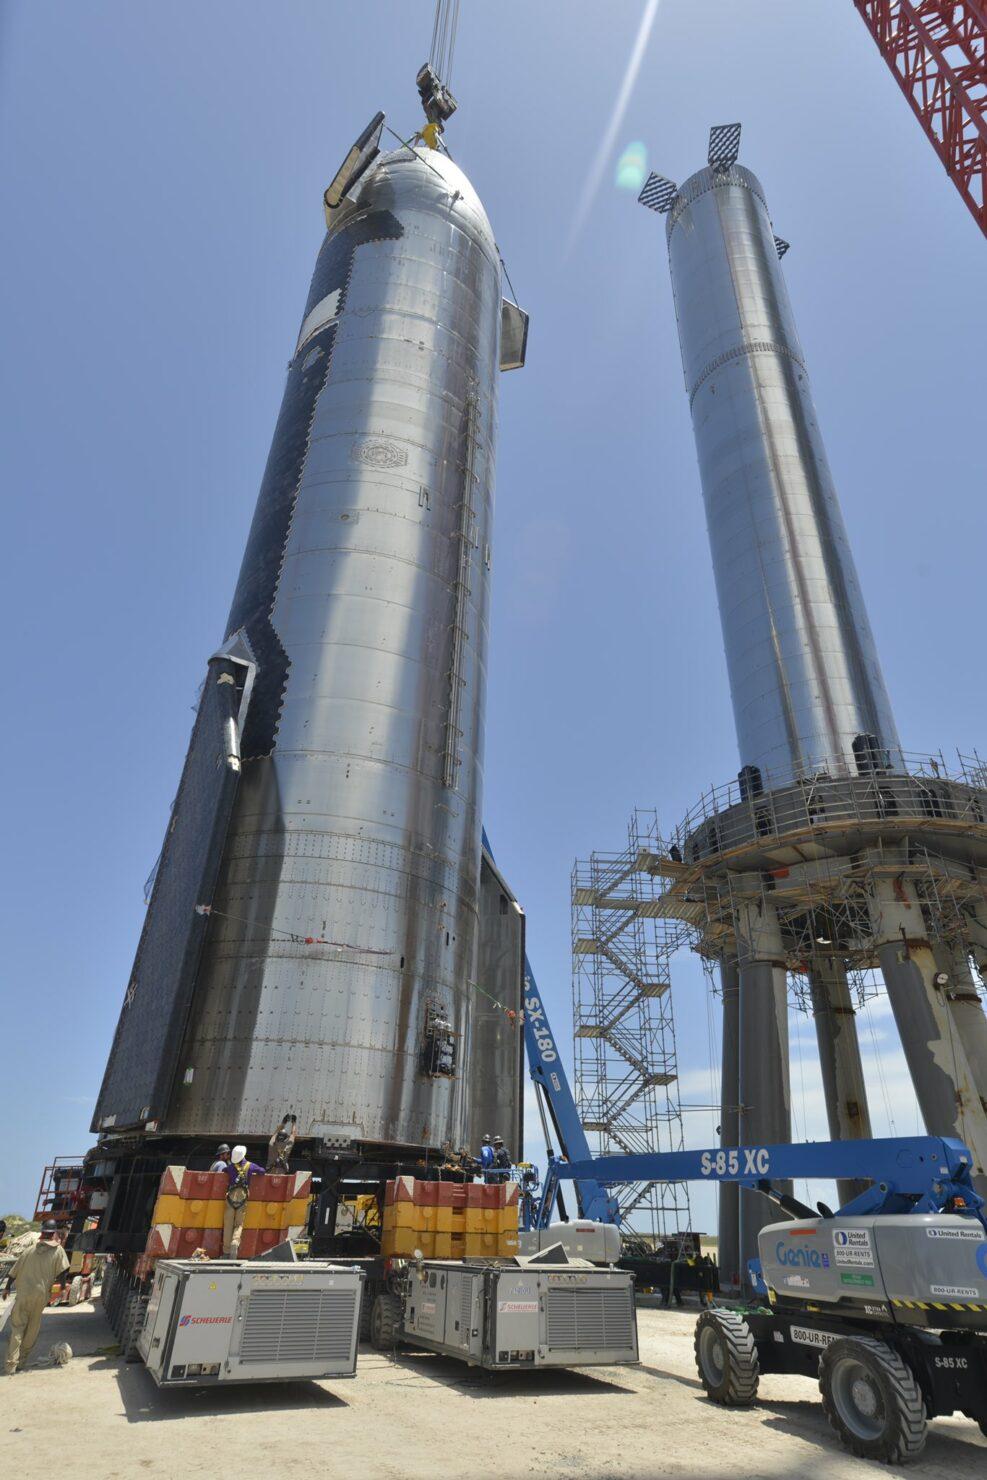 SpaceX Starship Super Heavy